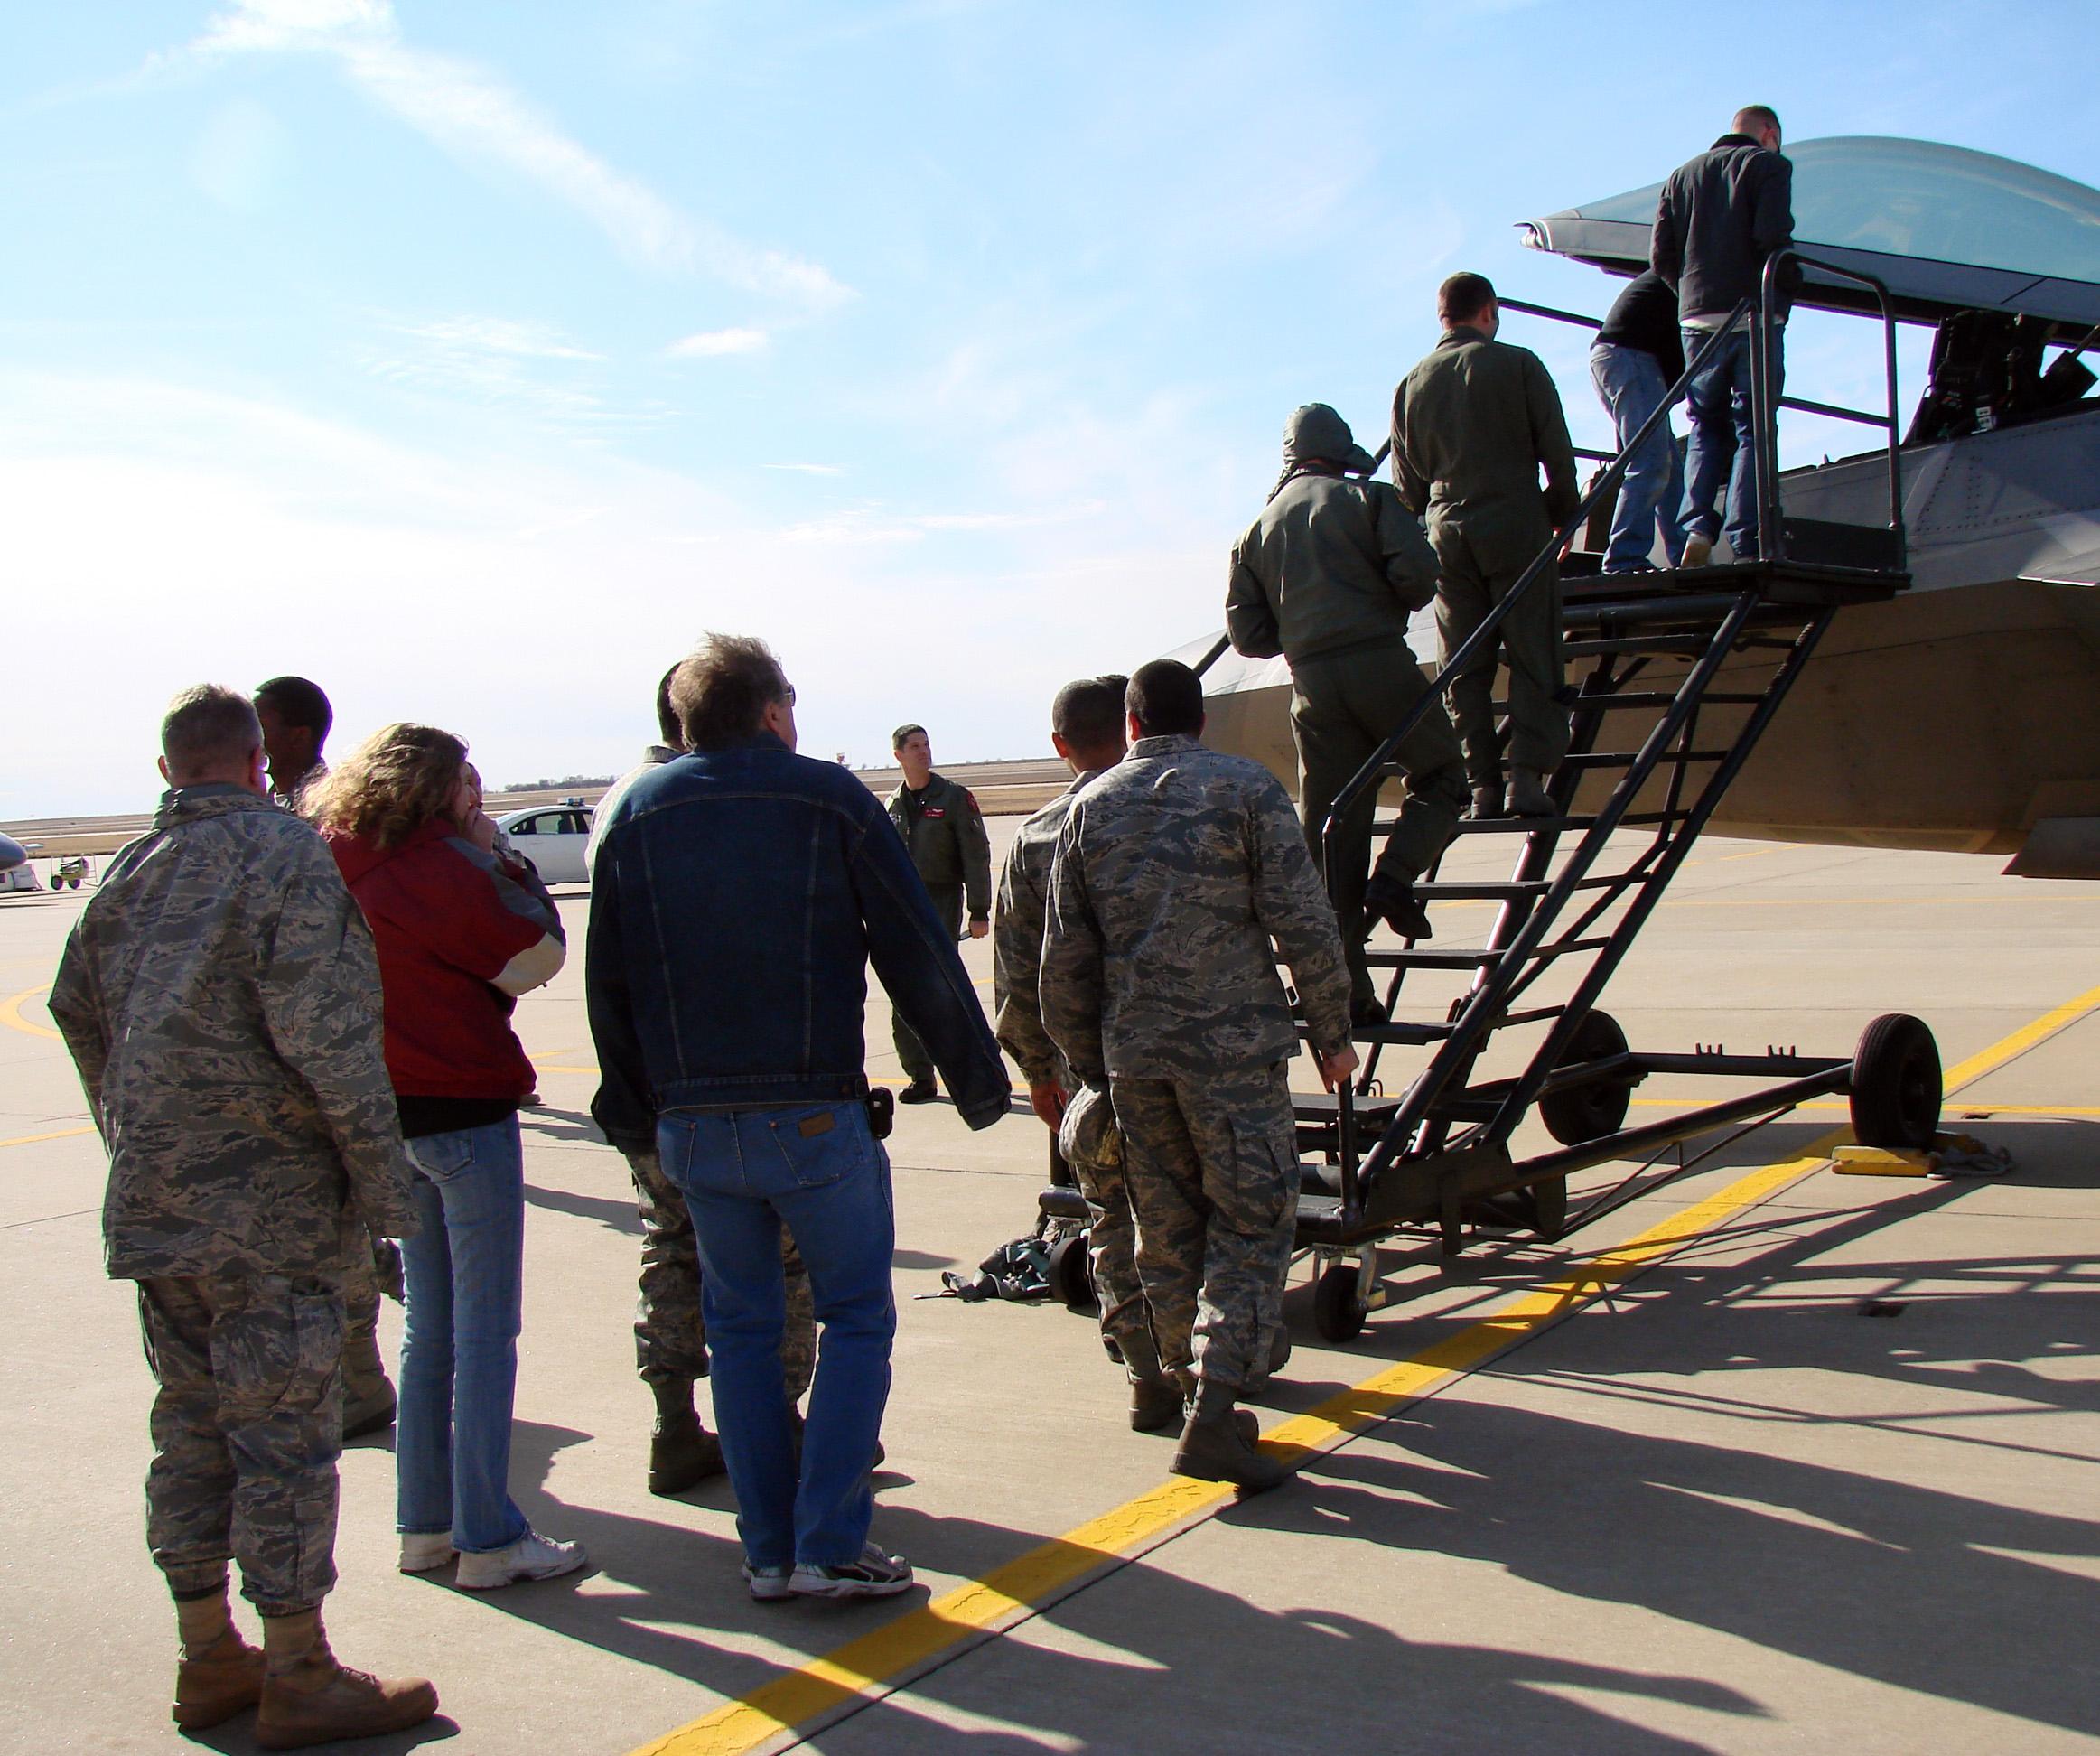 Team Vance gets close-up look at F-22 Raptor > Vance Air